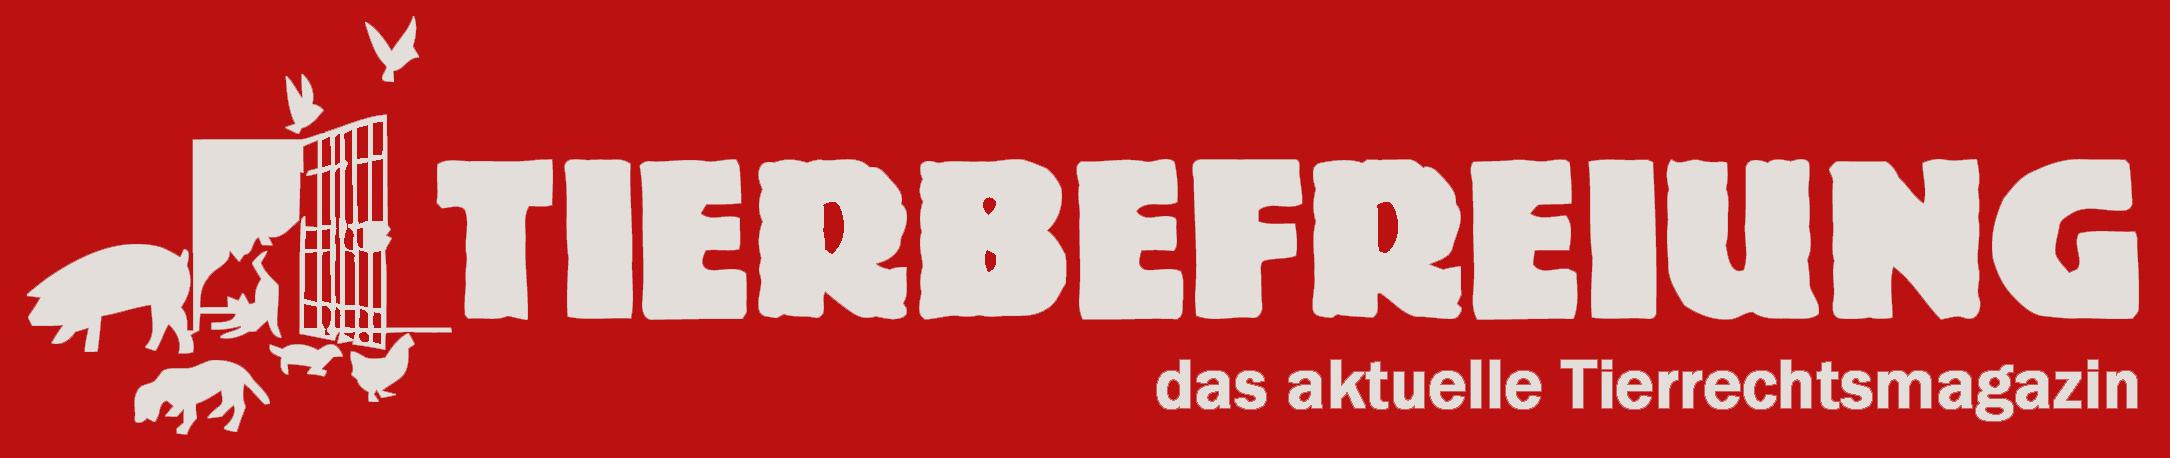 Logo Tierbefreiung - das aktuelle Tierrechtsmagazin